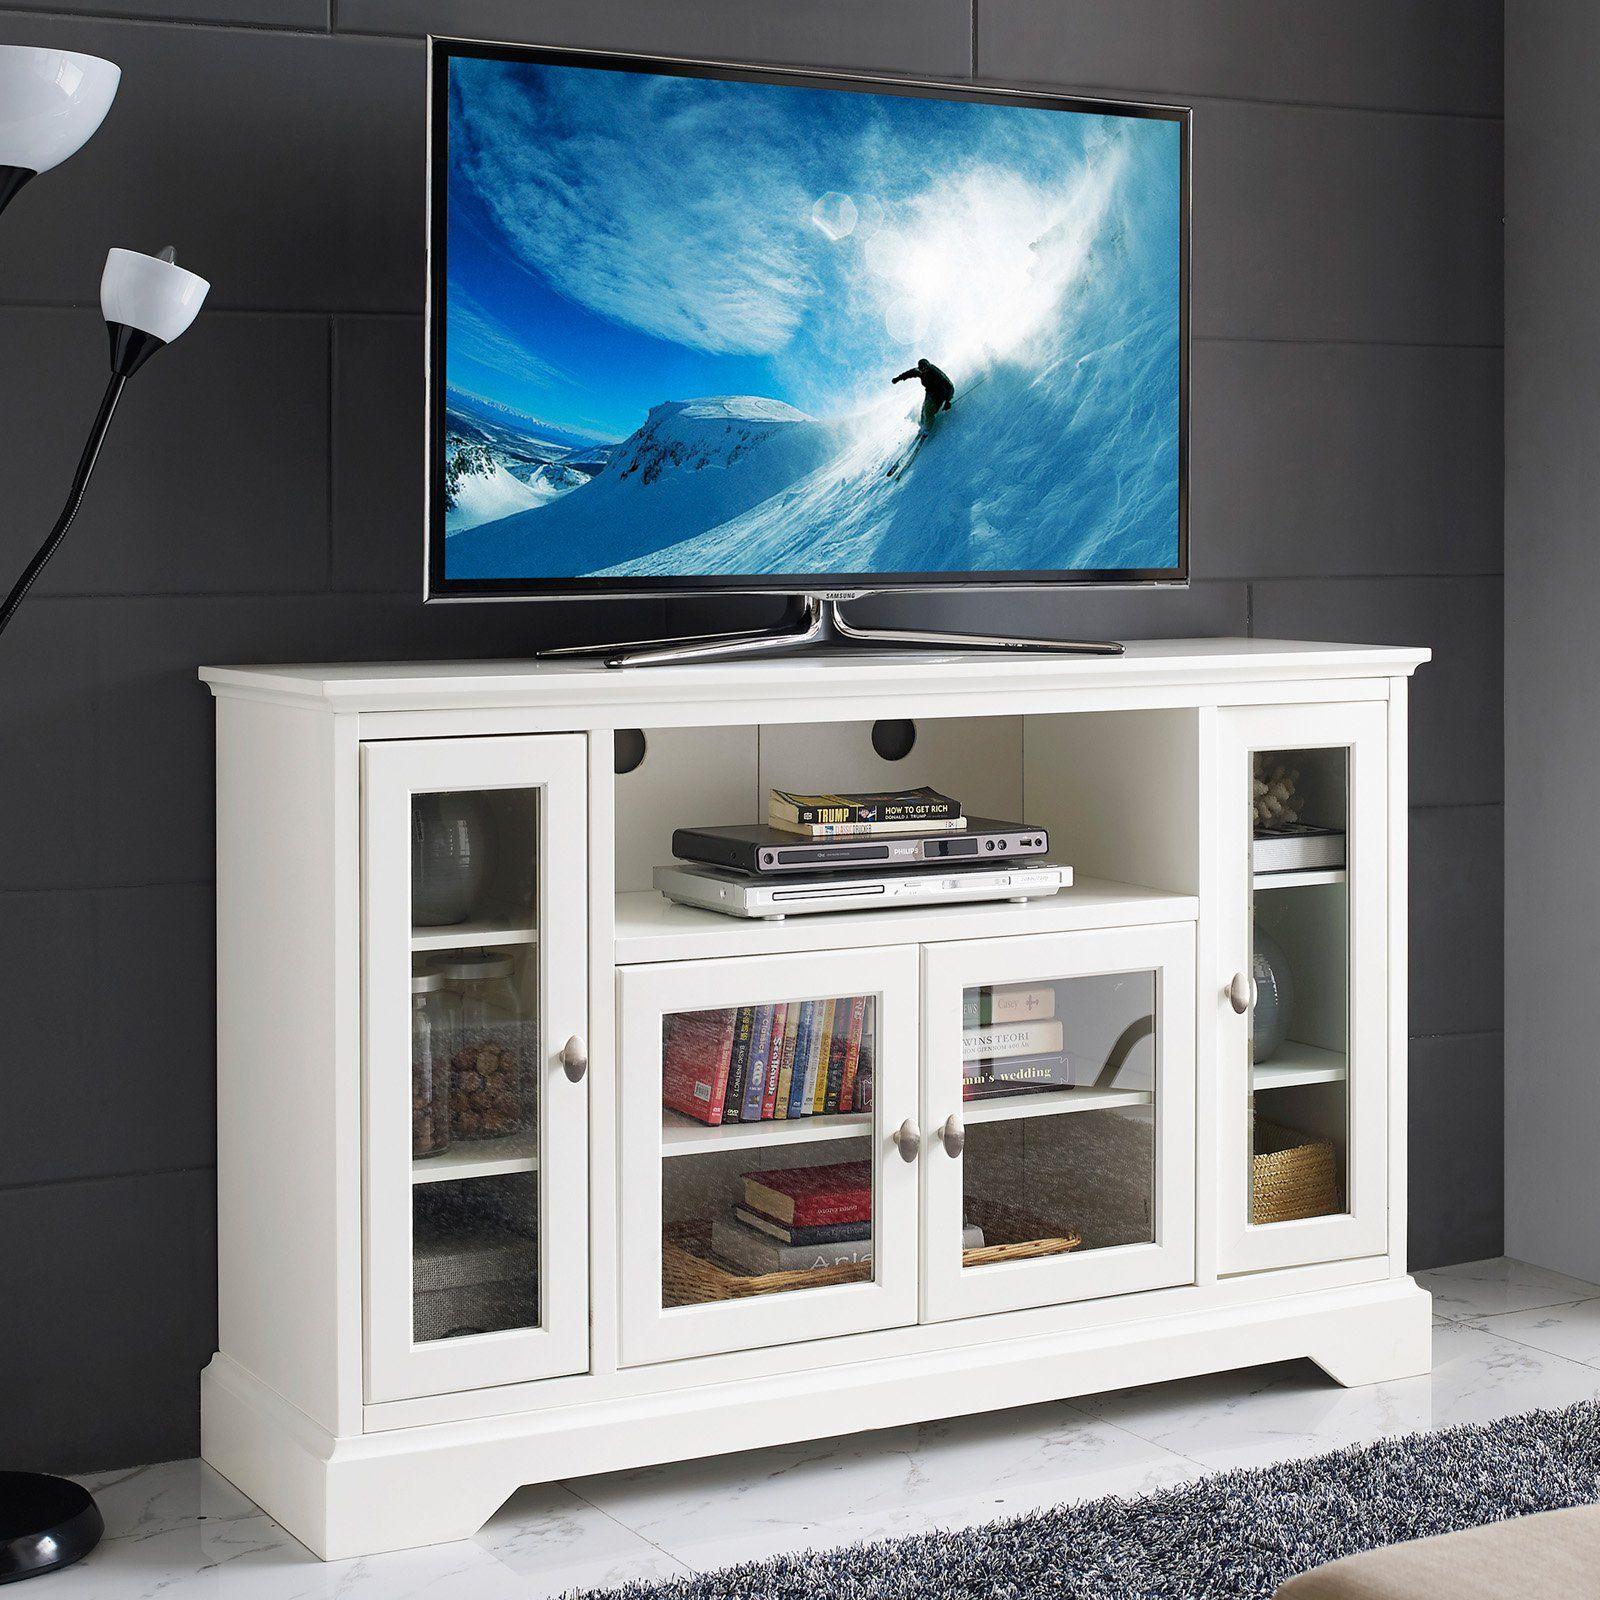 Walker Edison Highboy Style Wood Tv Stand Tv Stand Wood White Tv Stands Highboy Tv Stand